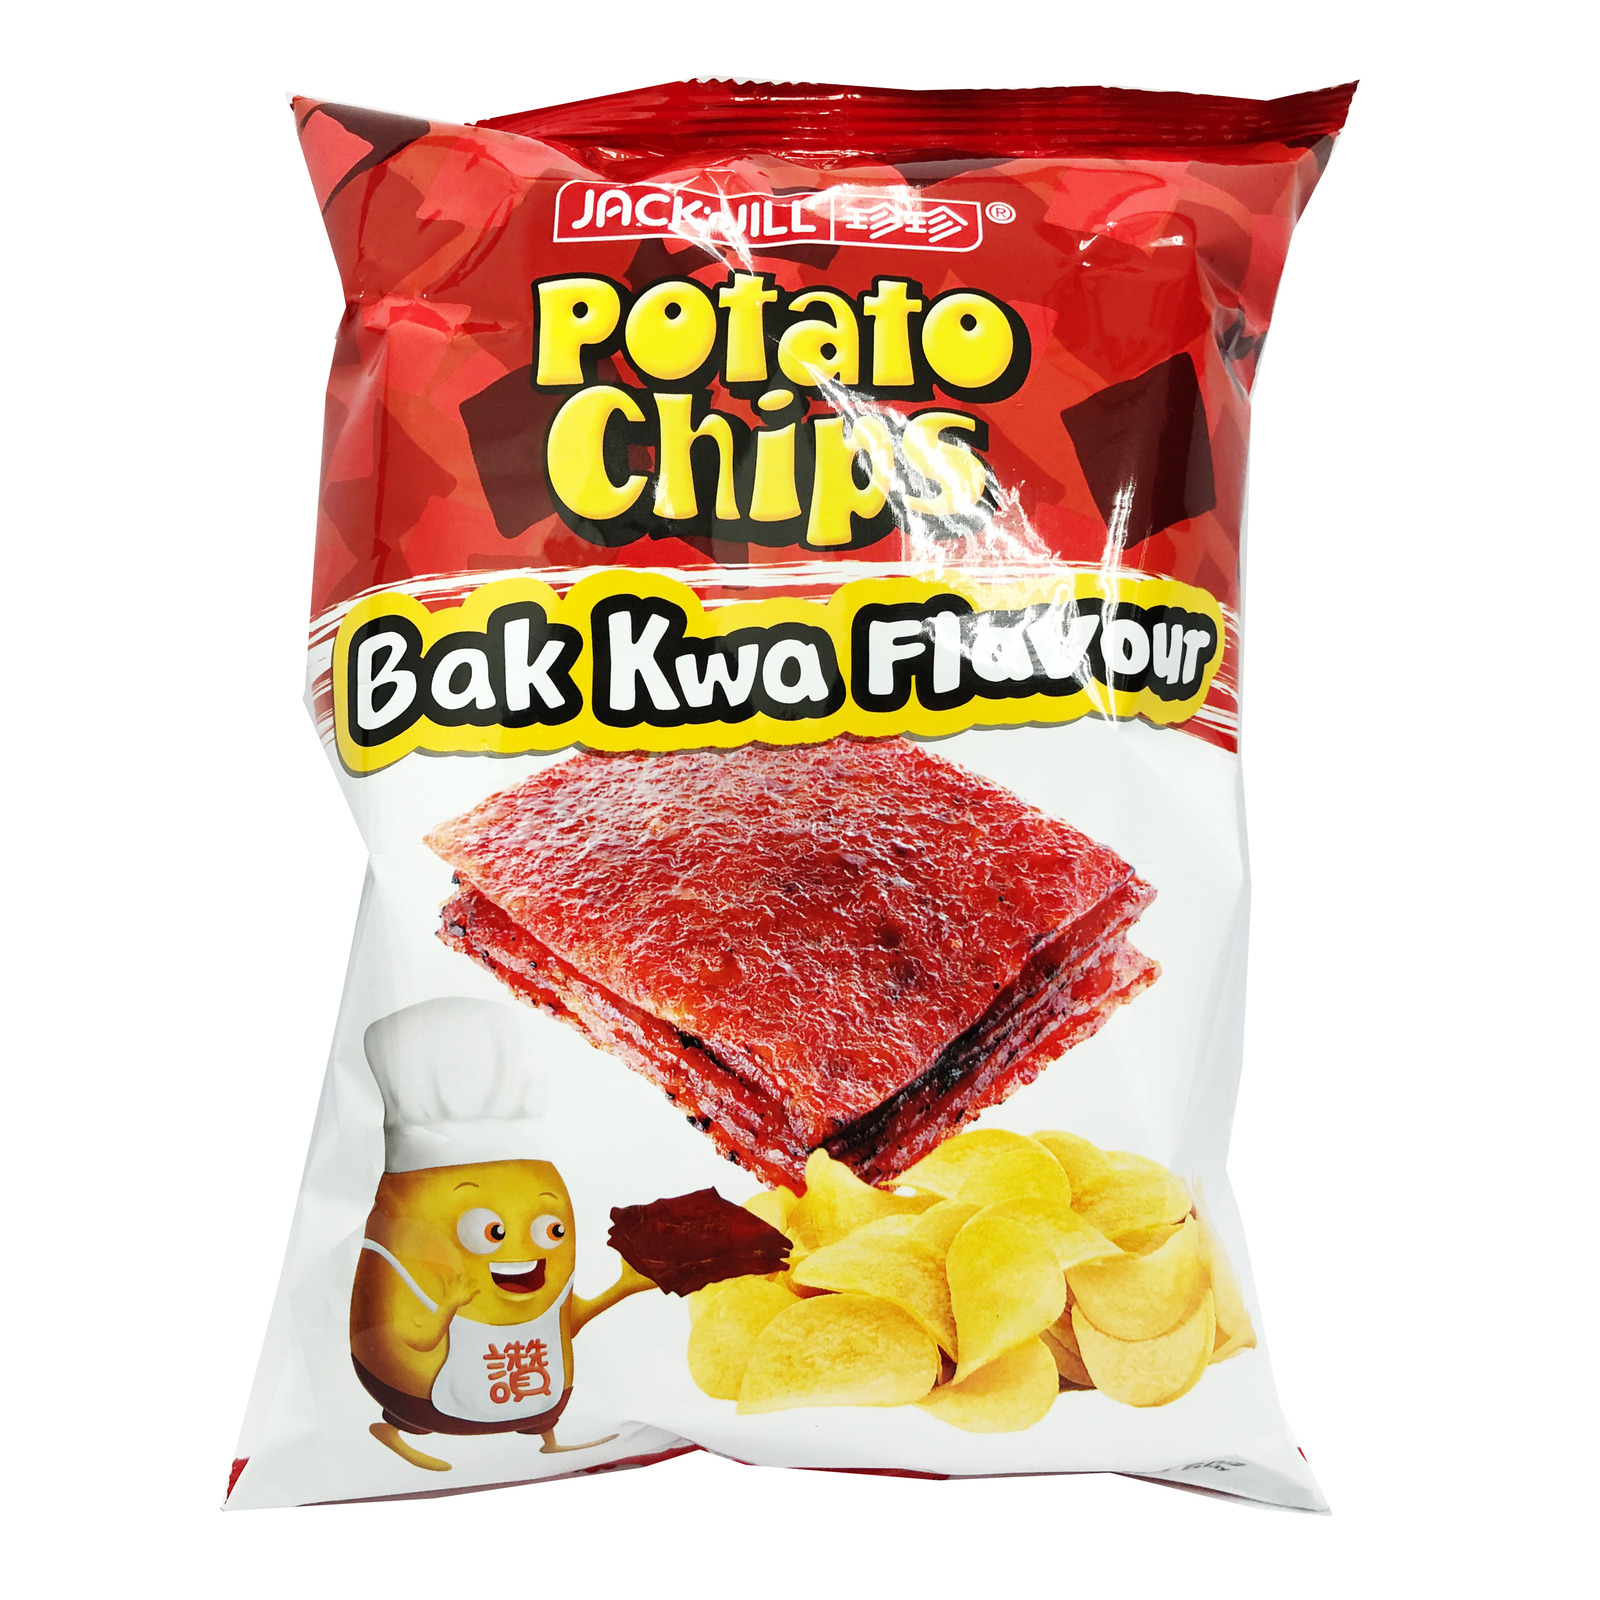 Jack 'n Jill Potato Chips - Bak Kwa